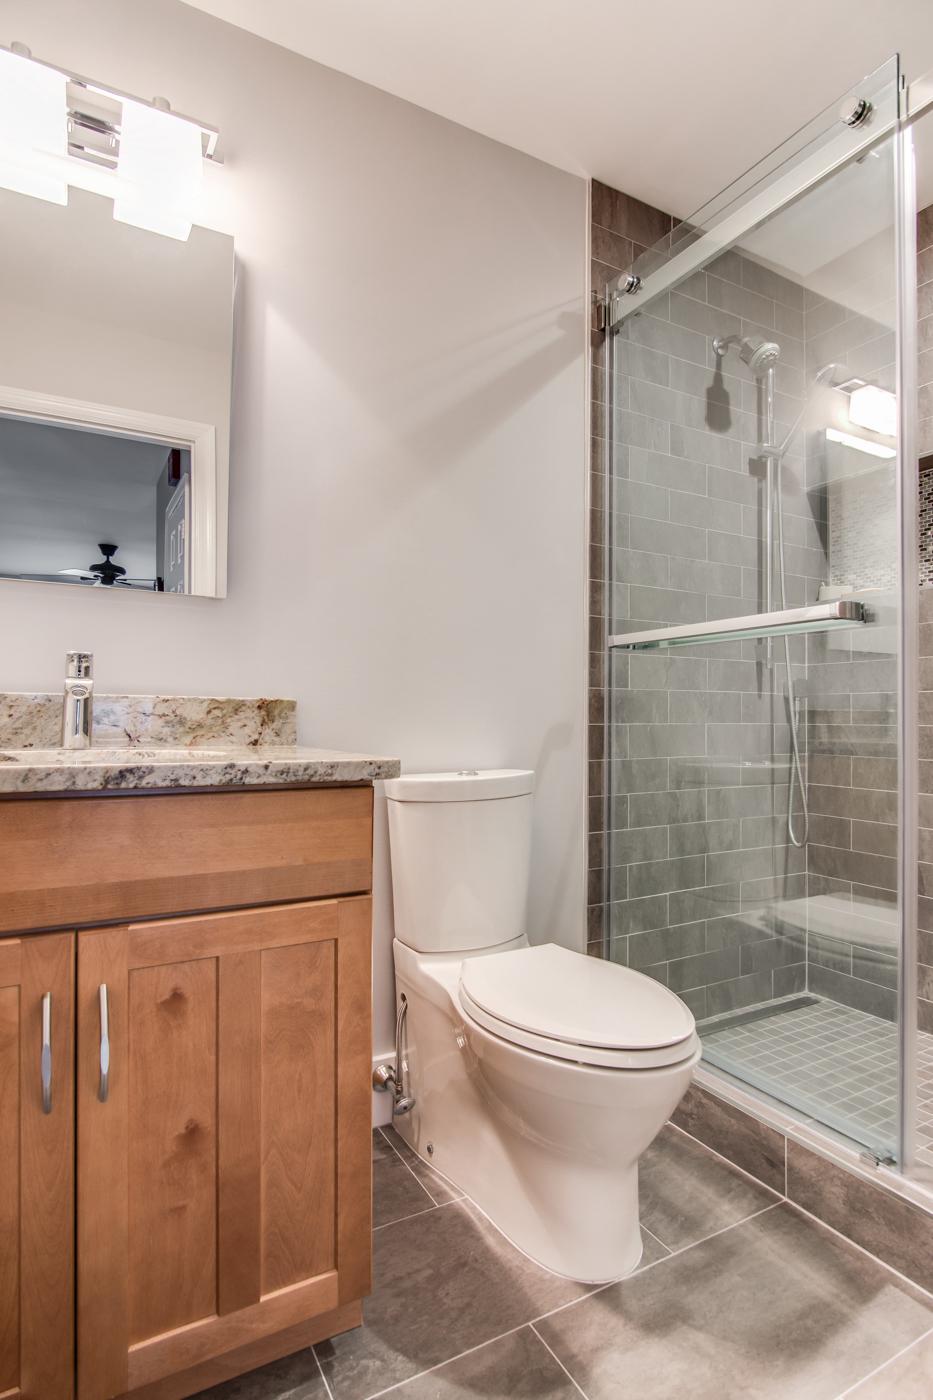 Mount Laurel NJ Bathroom Remodel   Cawley   DES Home Renovations